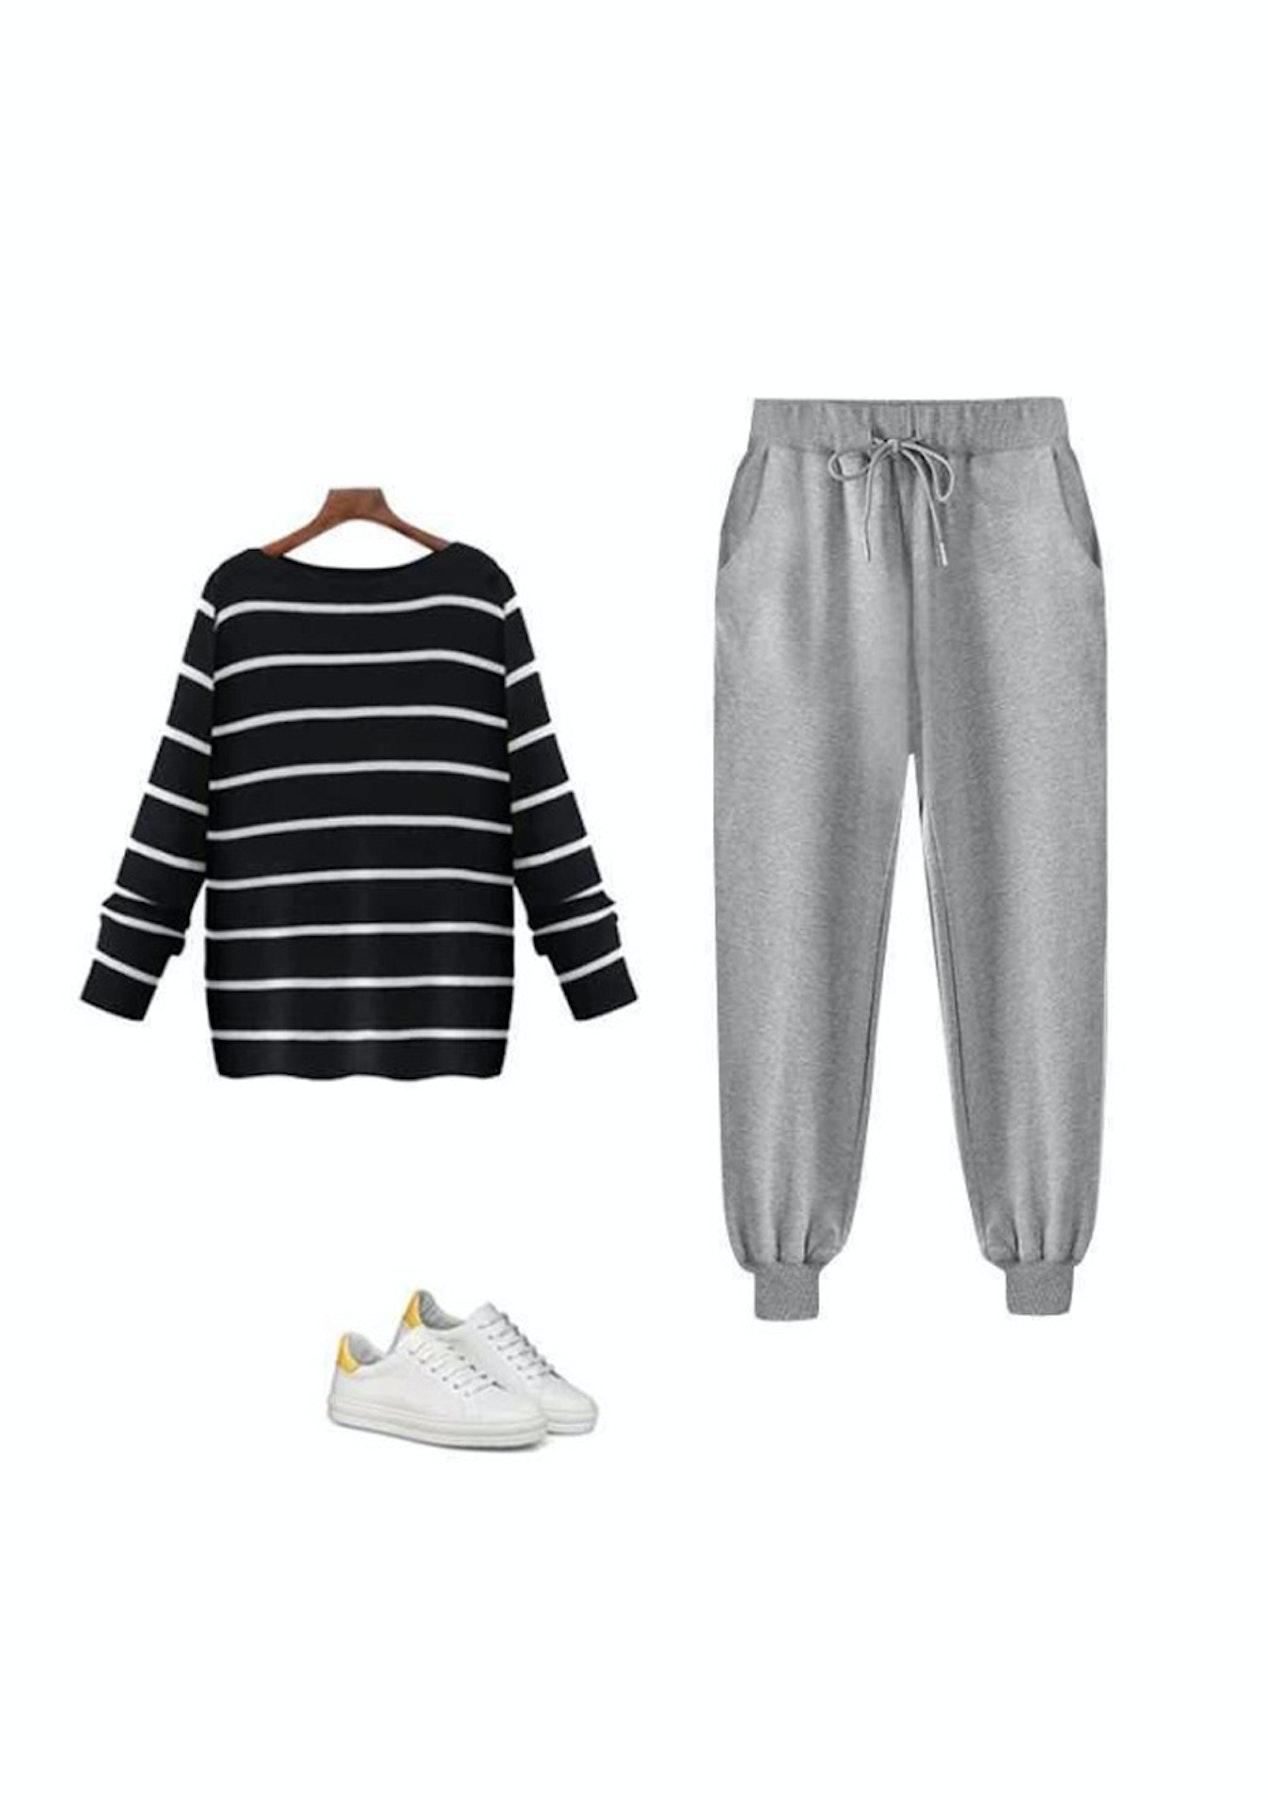 Fashion Edit  - Mono Leisure Pant - Marle Grey